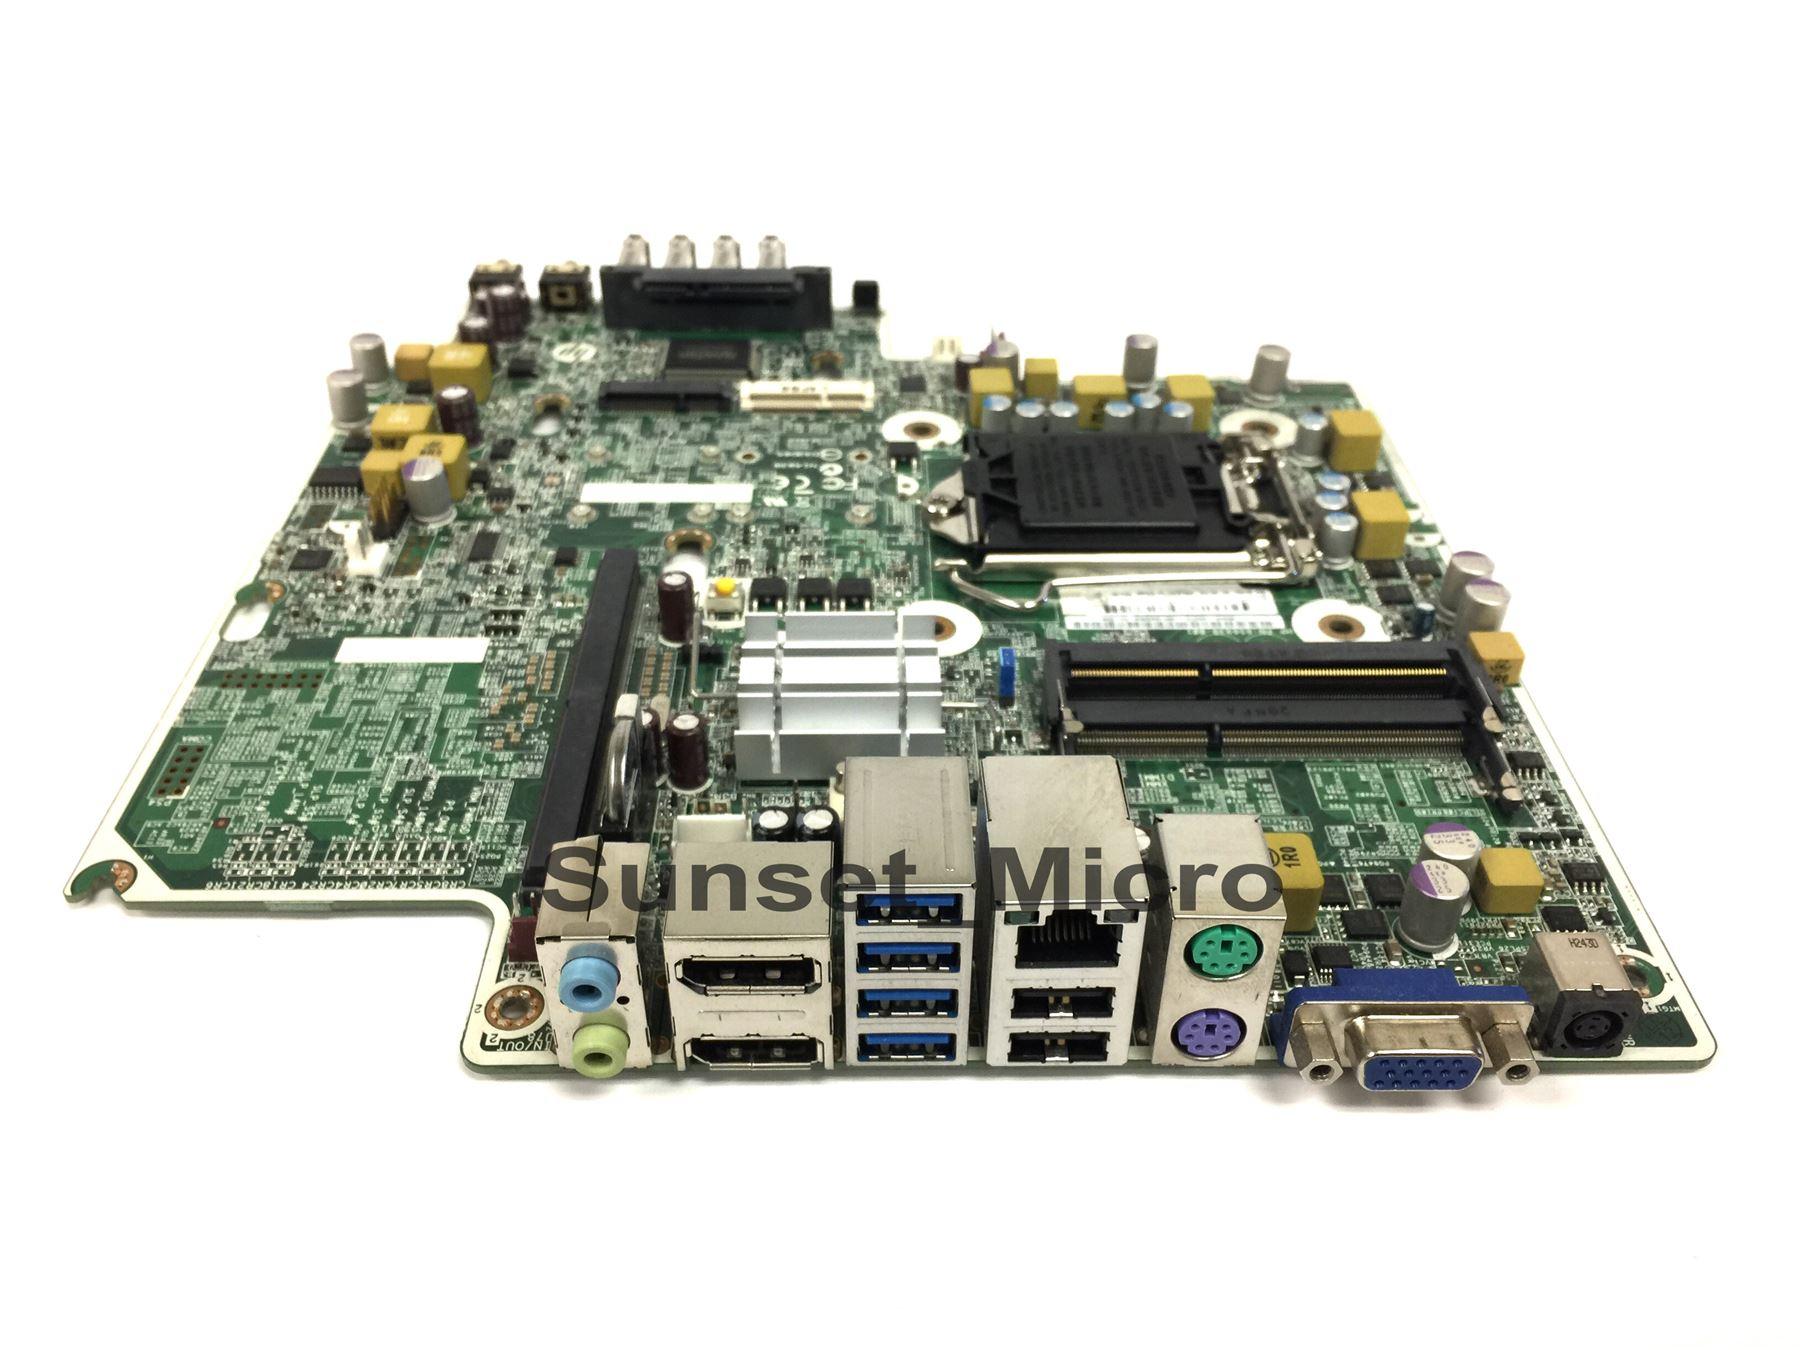 Details about HP Elite 8300 System Board ULTRA SLIM mainboard 657095-001  656937 656938 LGA1155